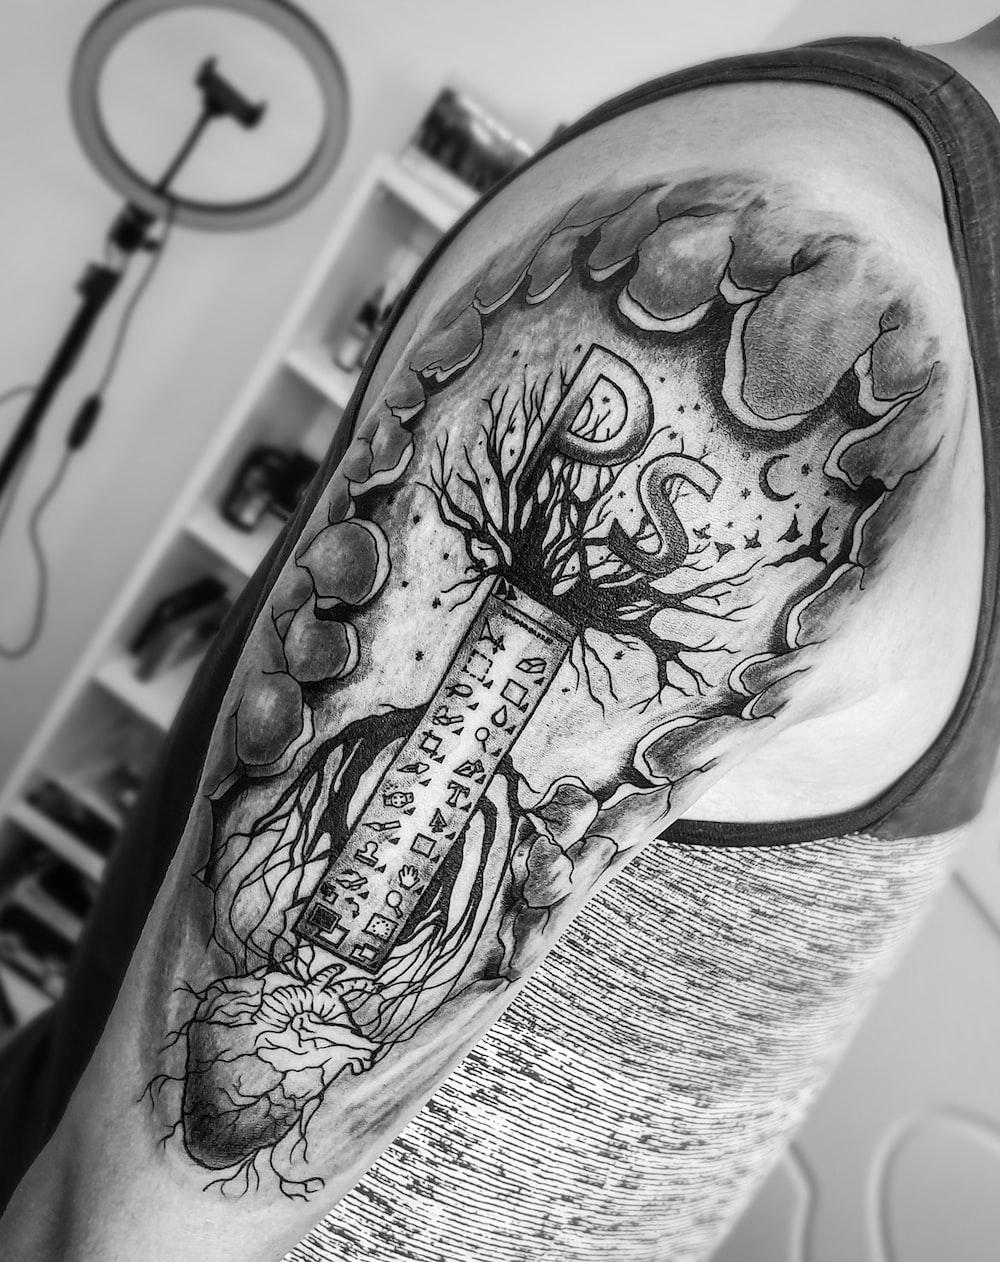 grayscale photo of skull tattoo